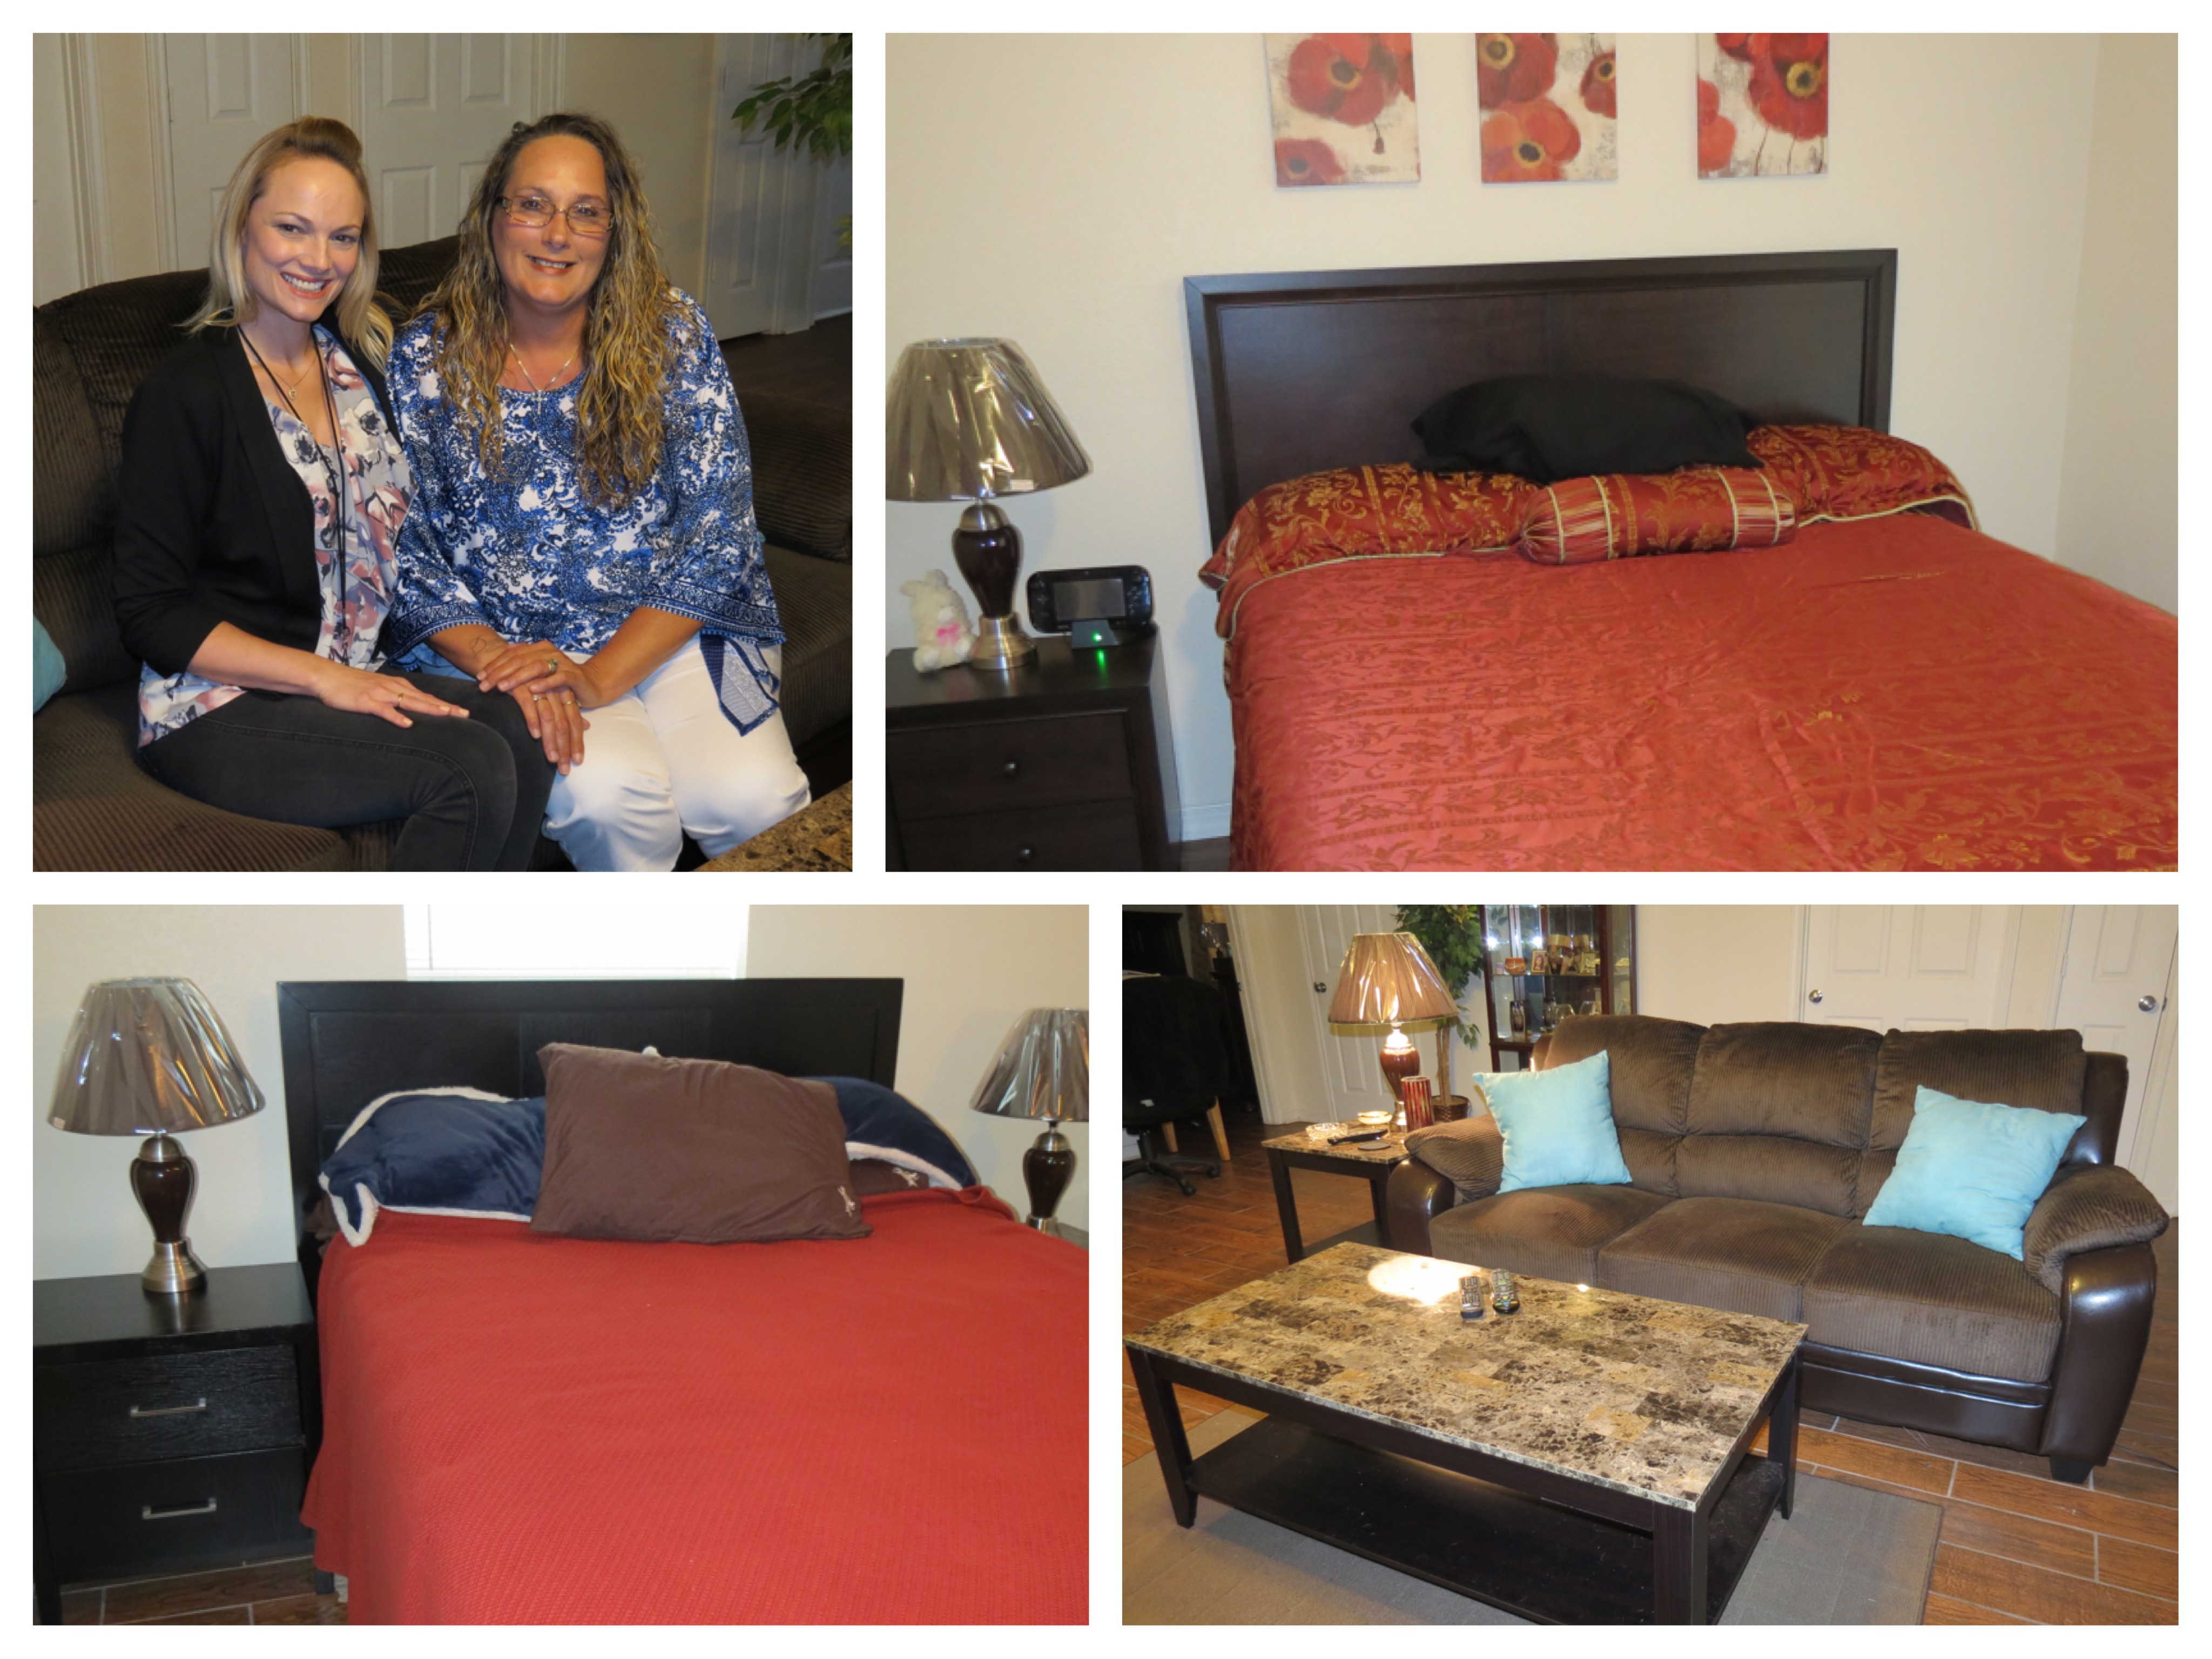 2018.08.16 Natasha Jones Furniture and Mara Collage.JPG